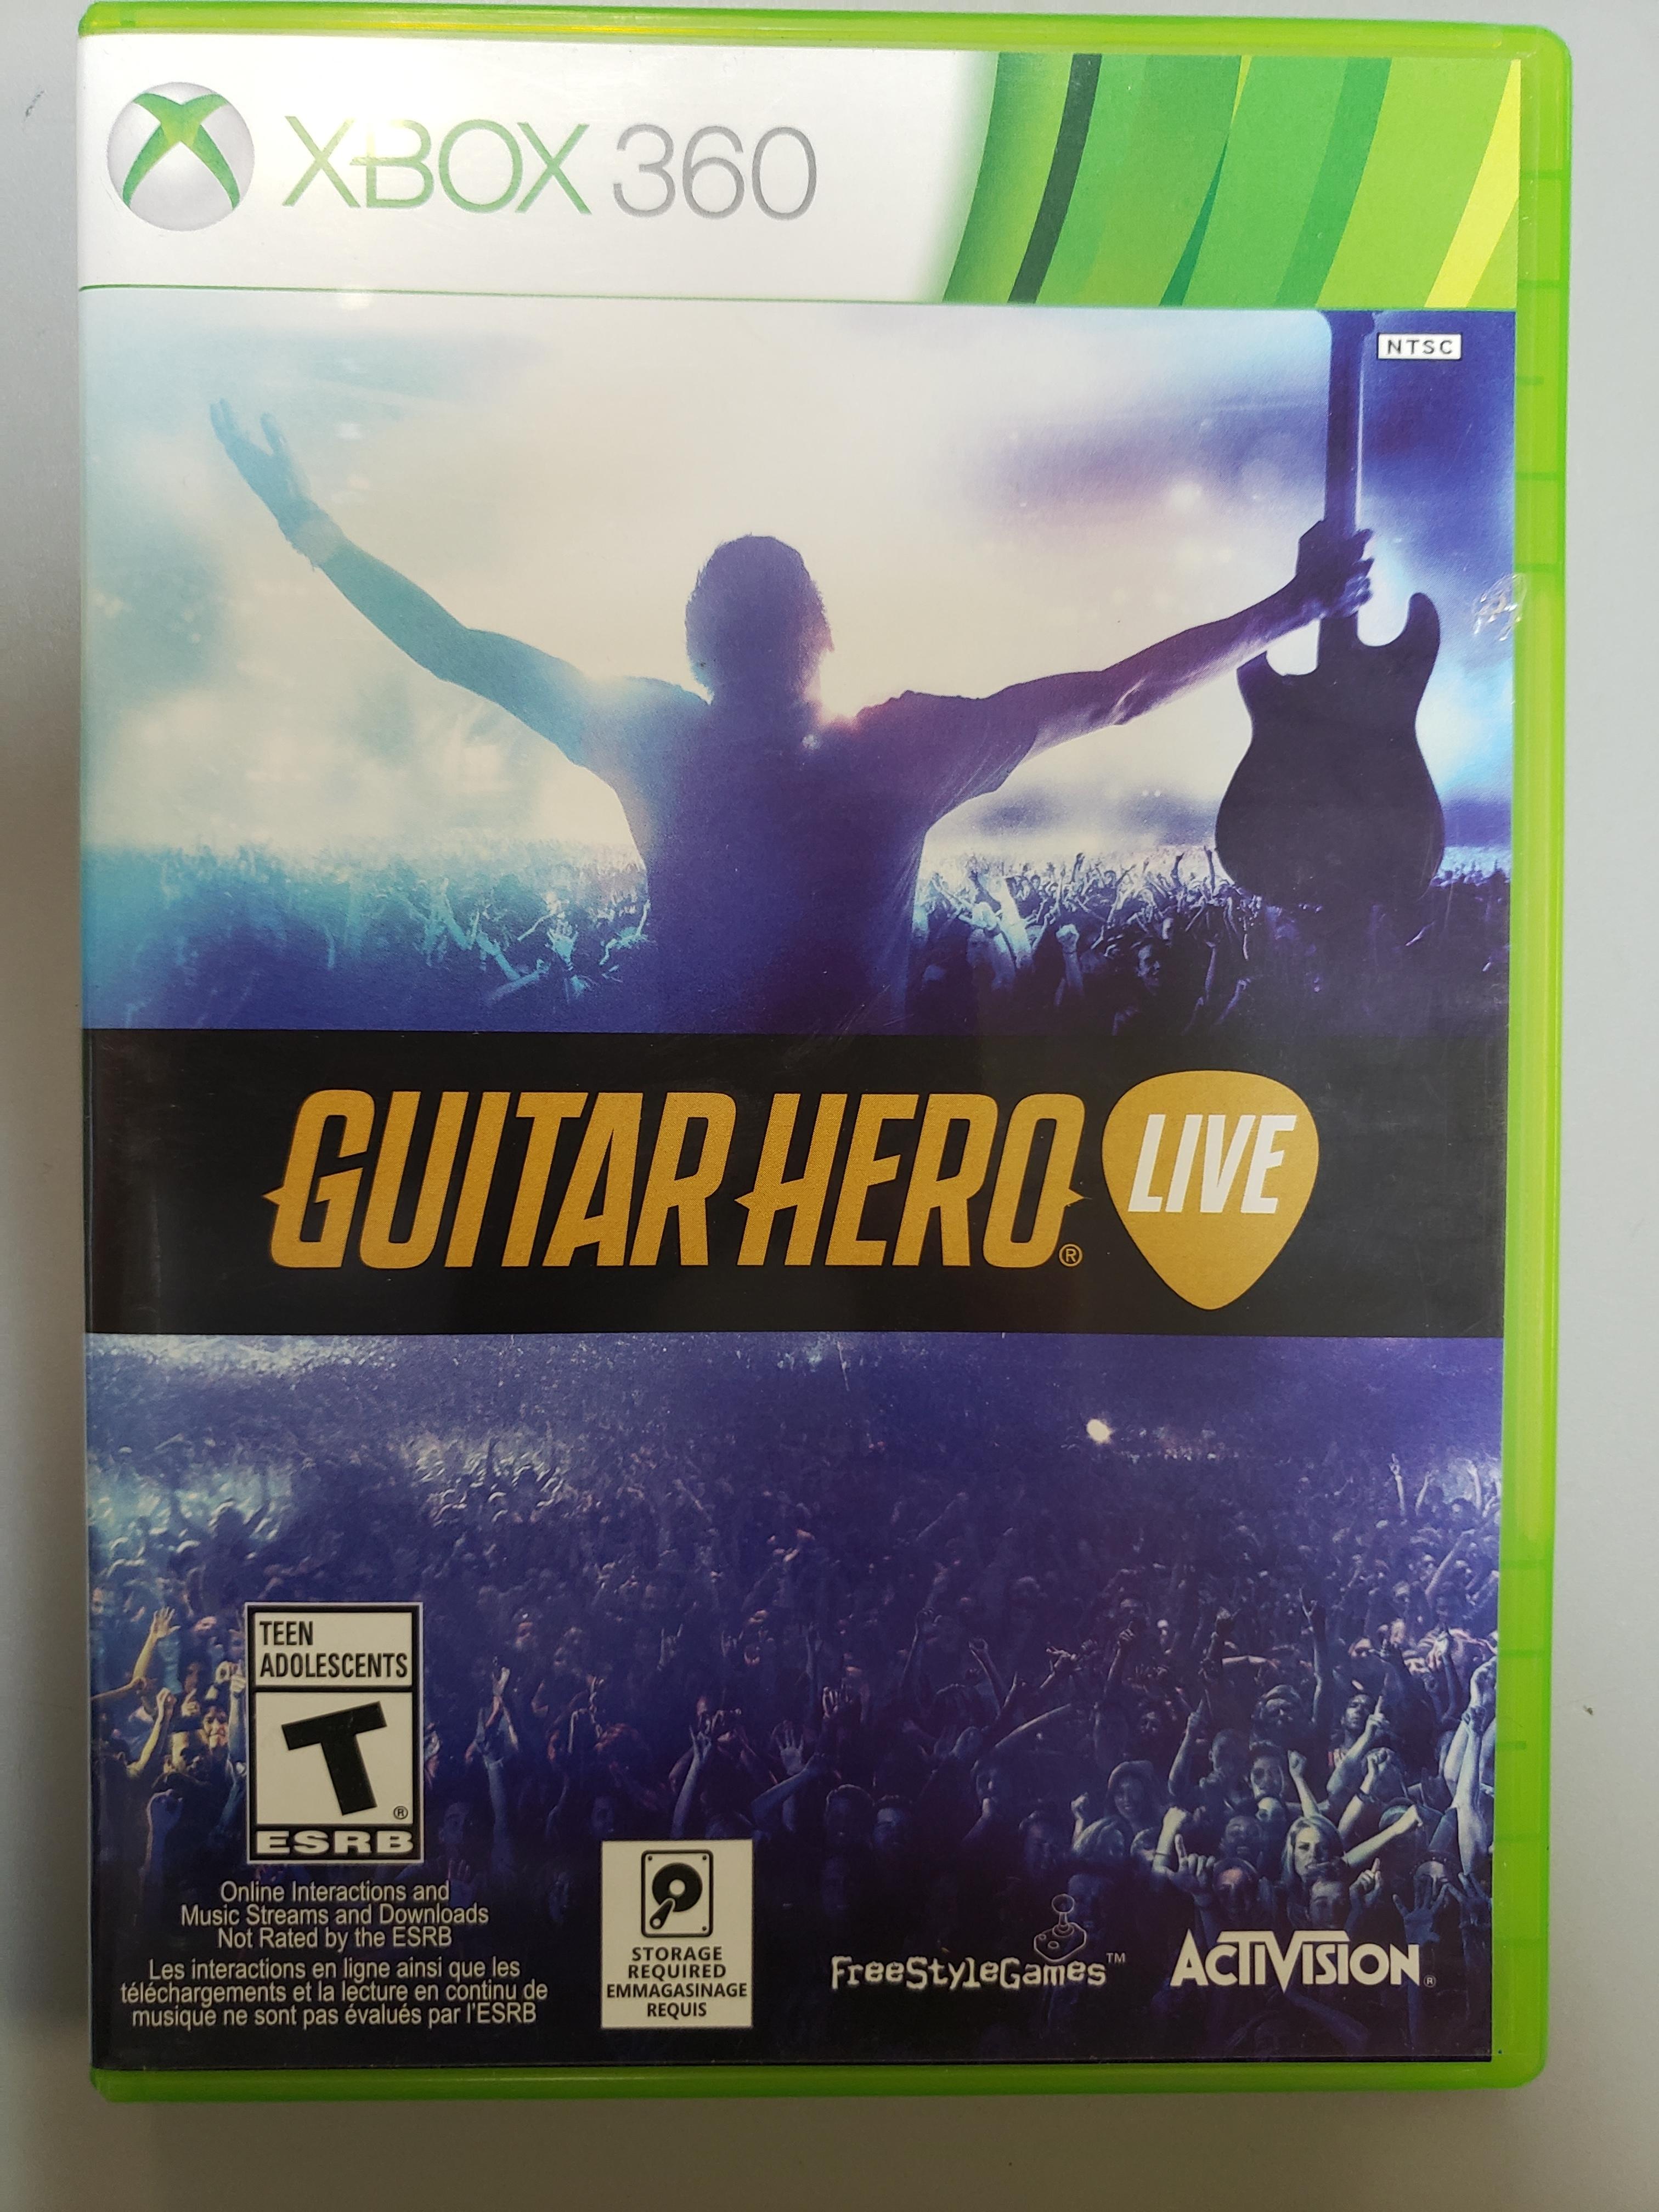 GUITAR HERO LIVE - XBOX 360 GAME